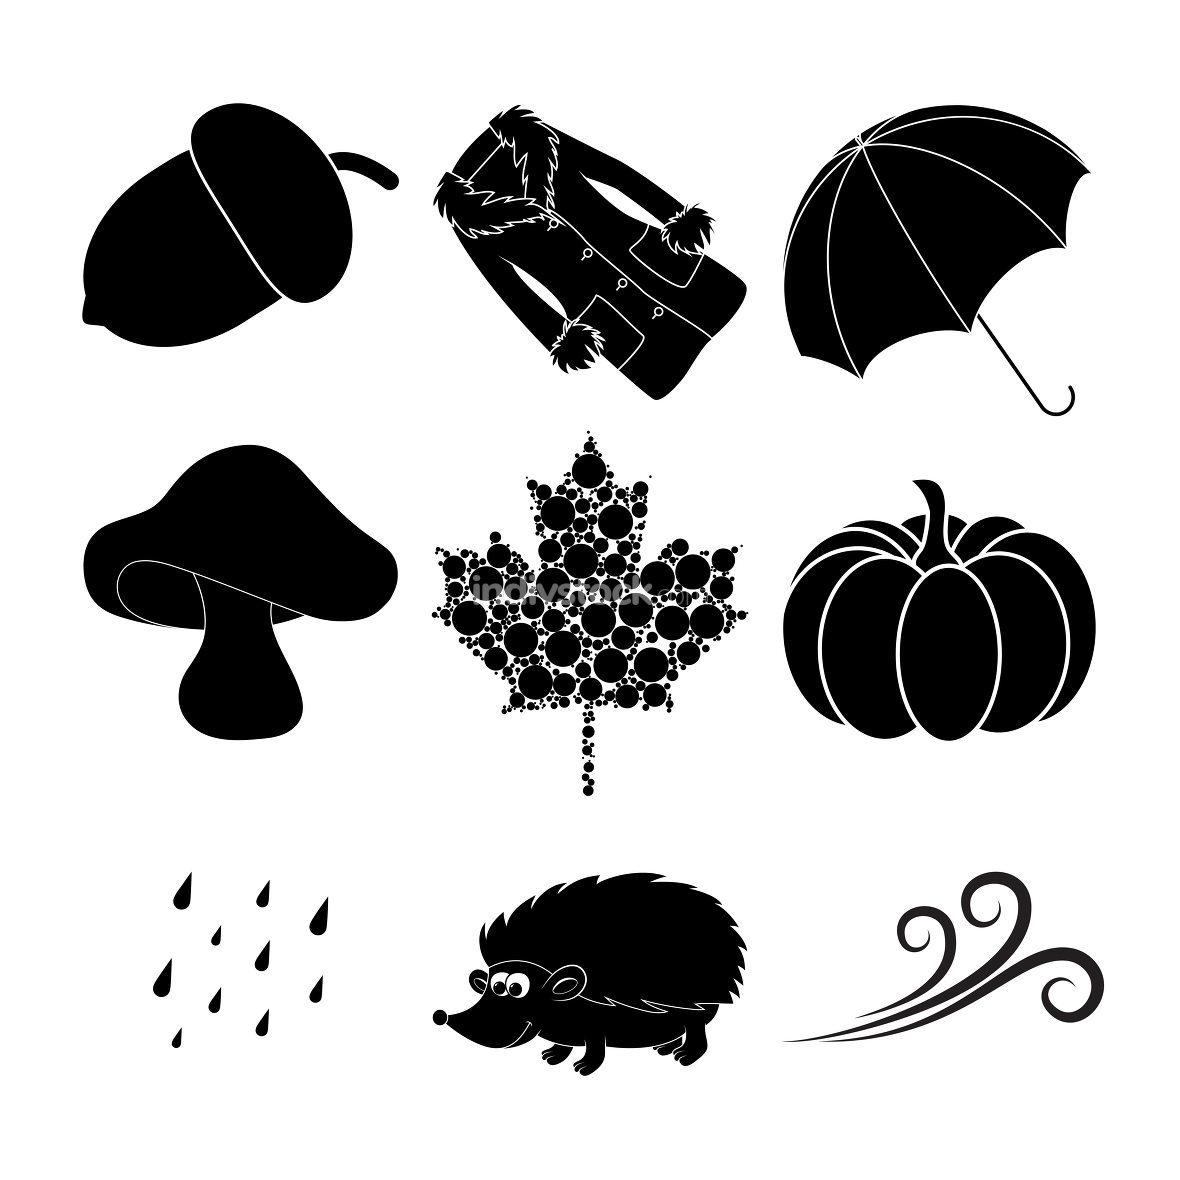 Monochrome seasonal illustration. Fall vector icons with umbrella, rain, wind, etc.